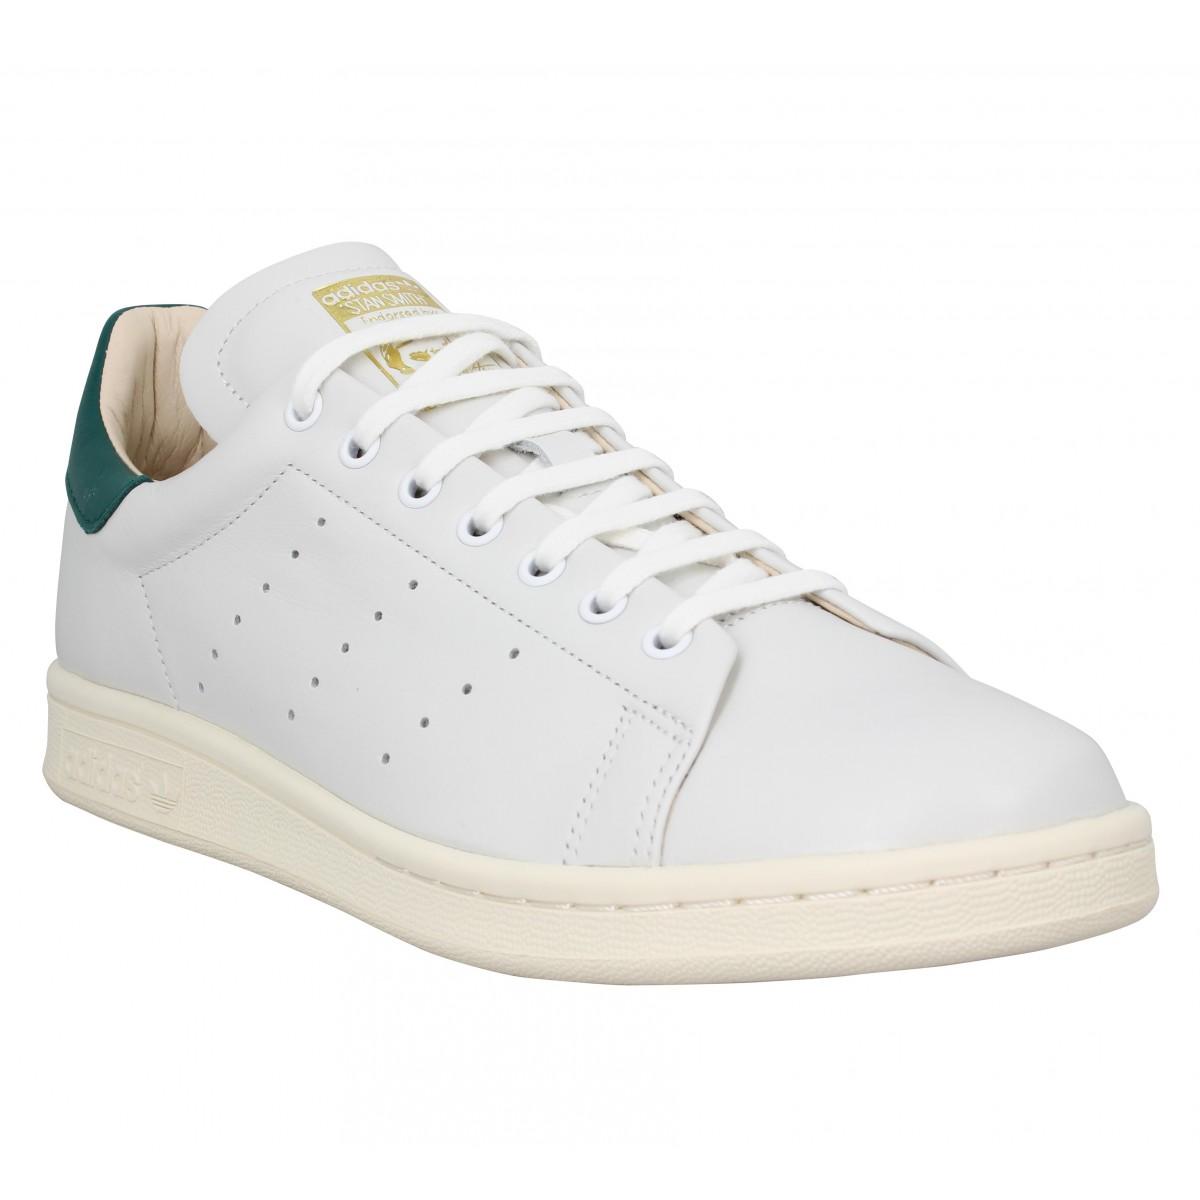 Adidas Homme Stan Smith Recon Cuir...